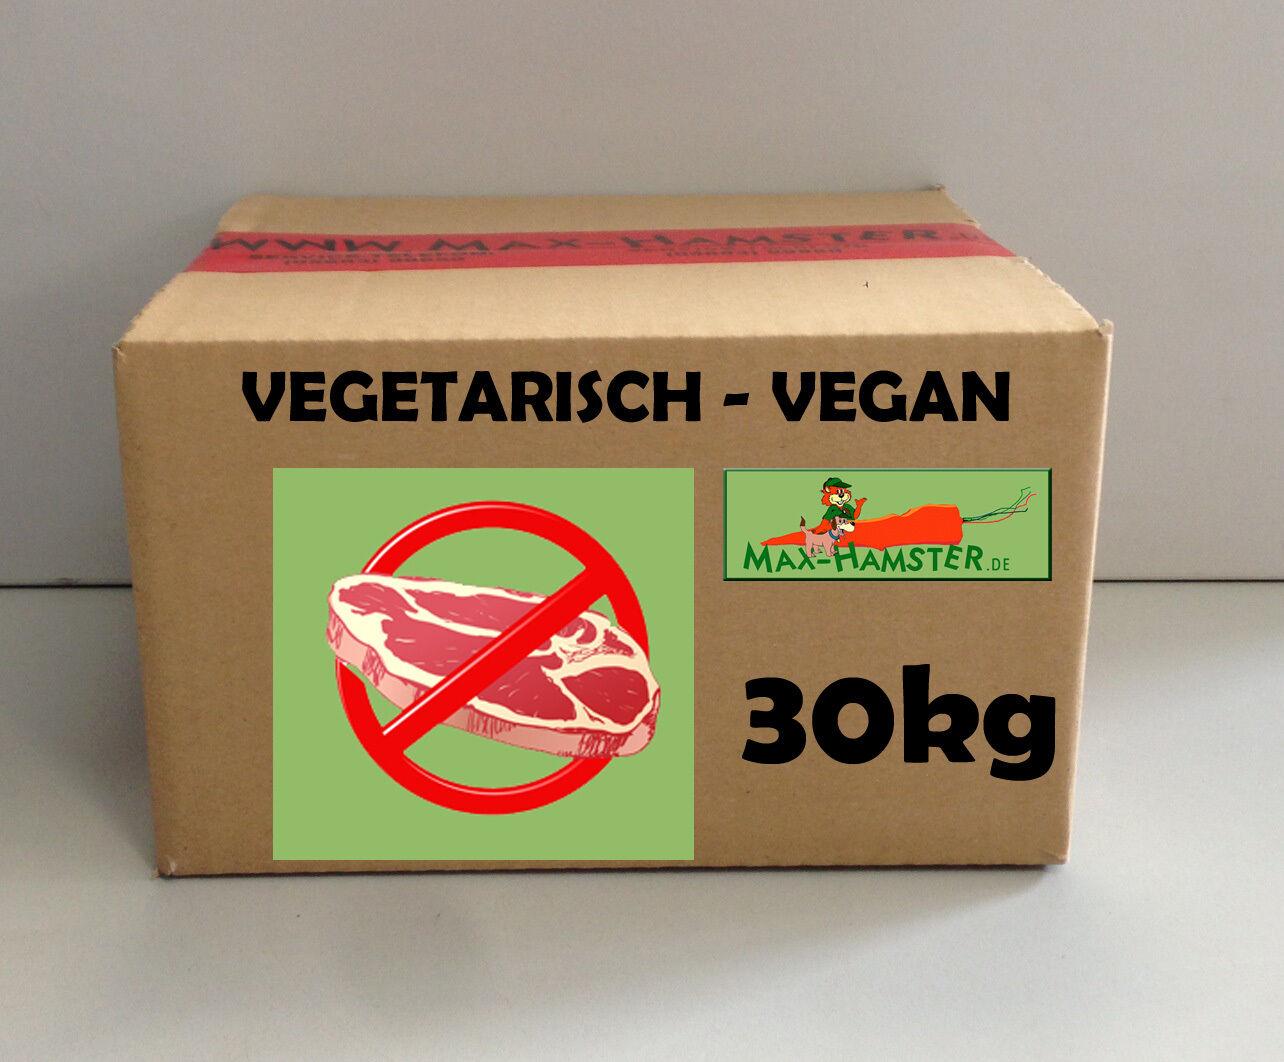 Nutrizionista cibo per cani VEGAN Di MaxHamster 28kg Premium qualitàvegetariano